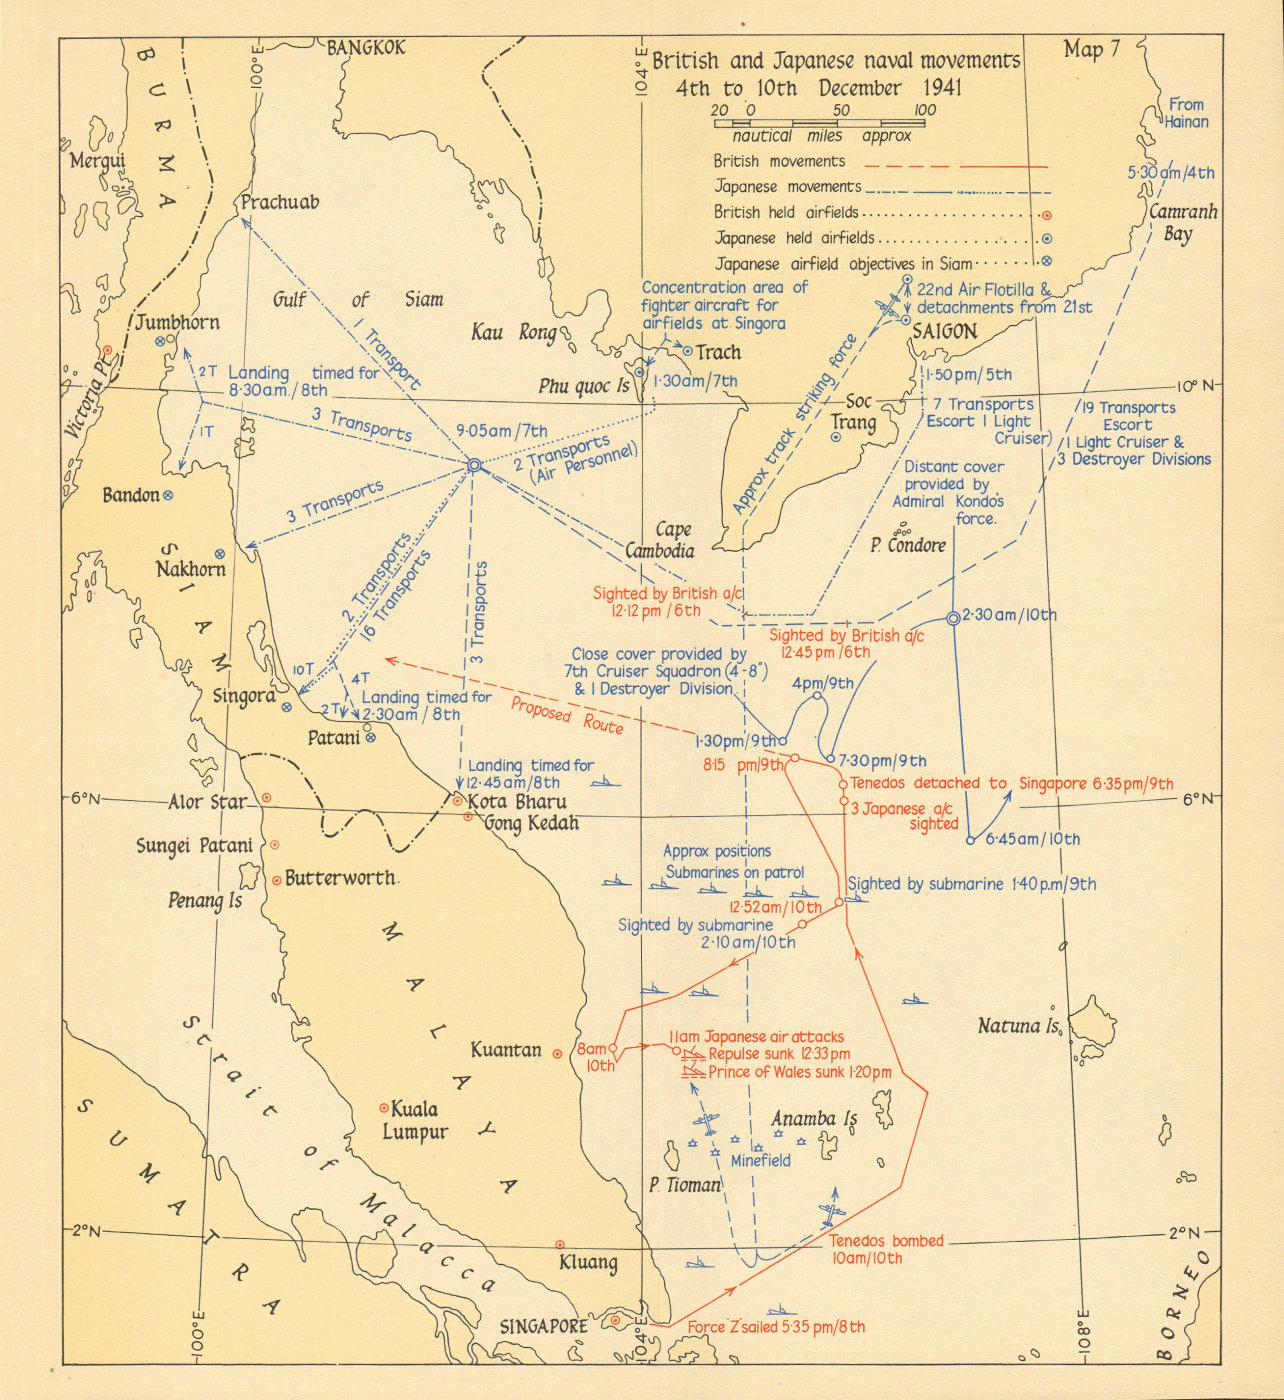 Associate Product Naval Battle of Malaya 4-10 December 1941. British & Japanese movements 1957 map